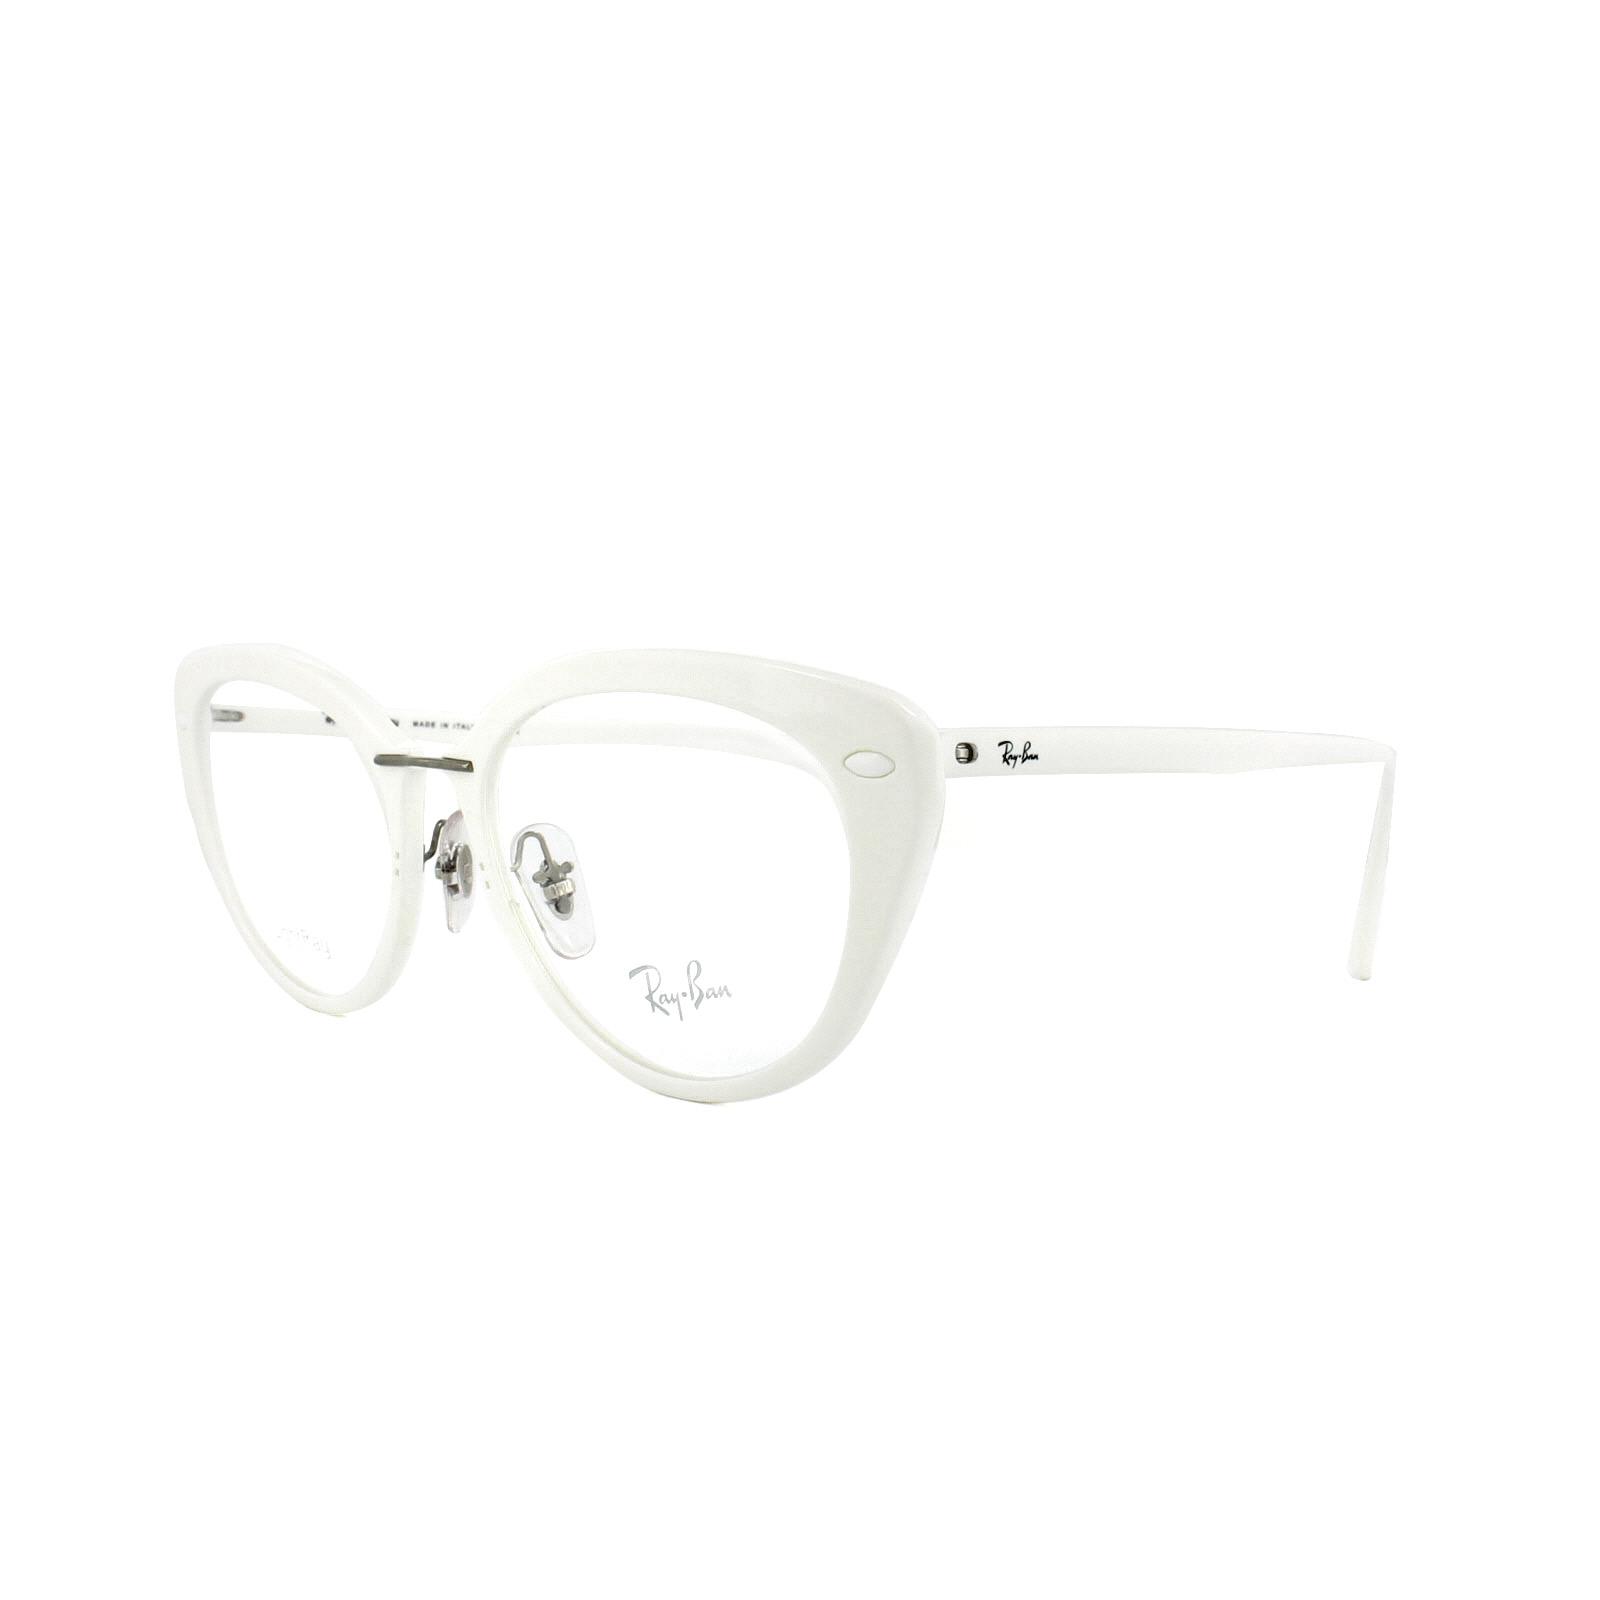 025a75e381 Sentinel Ray-Ban Glasses Frames RX 7088 5618 Shiny White Womens 54mm